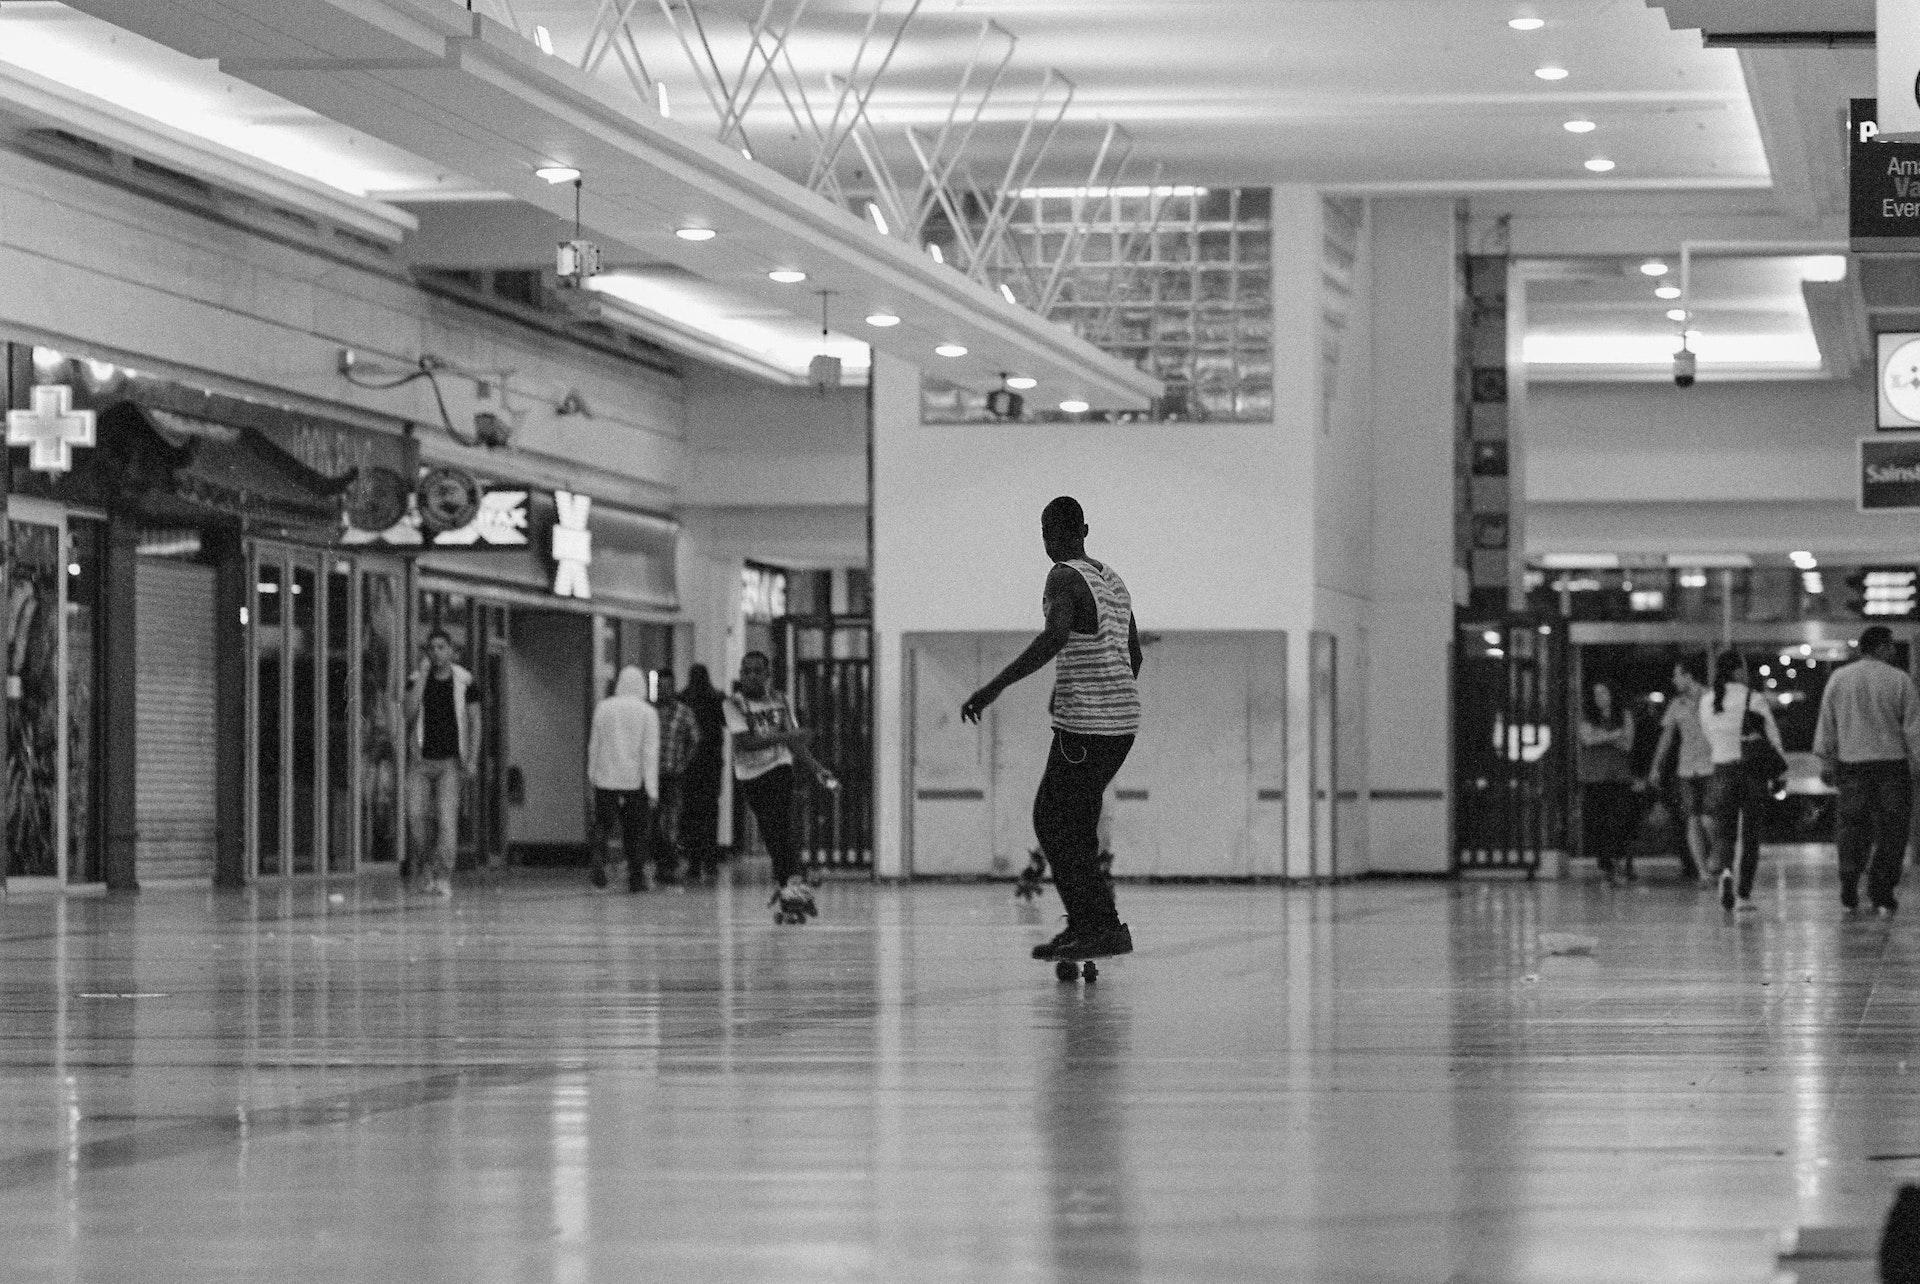 Stratford_Centre_Skaters_Lighter-32